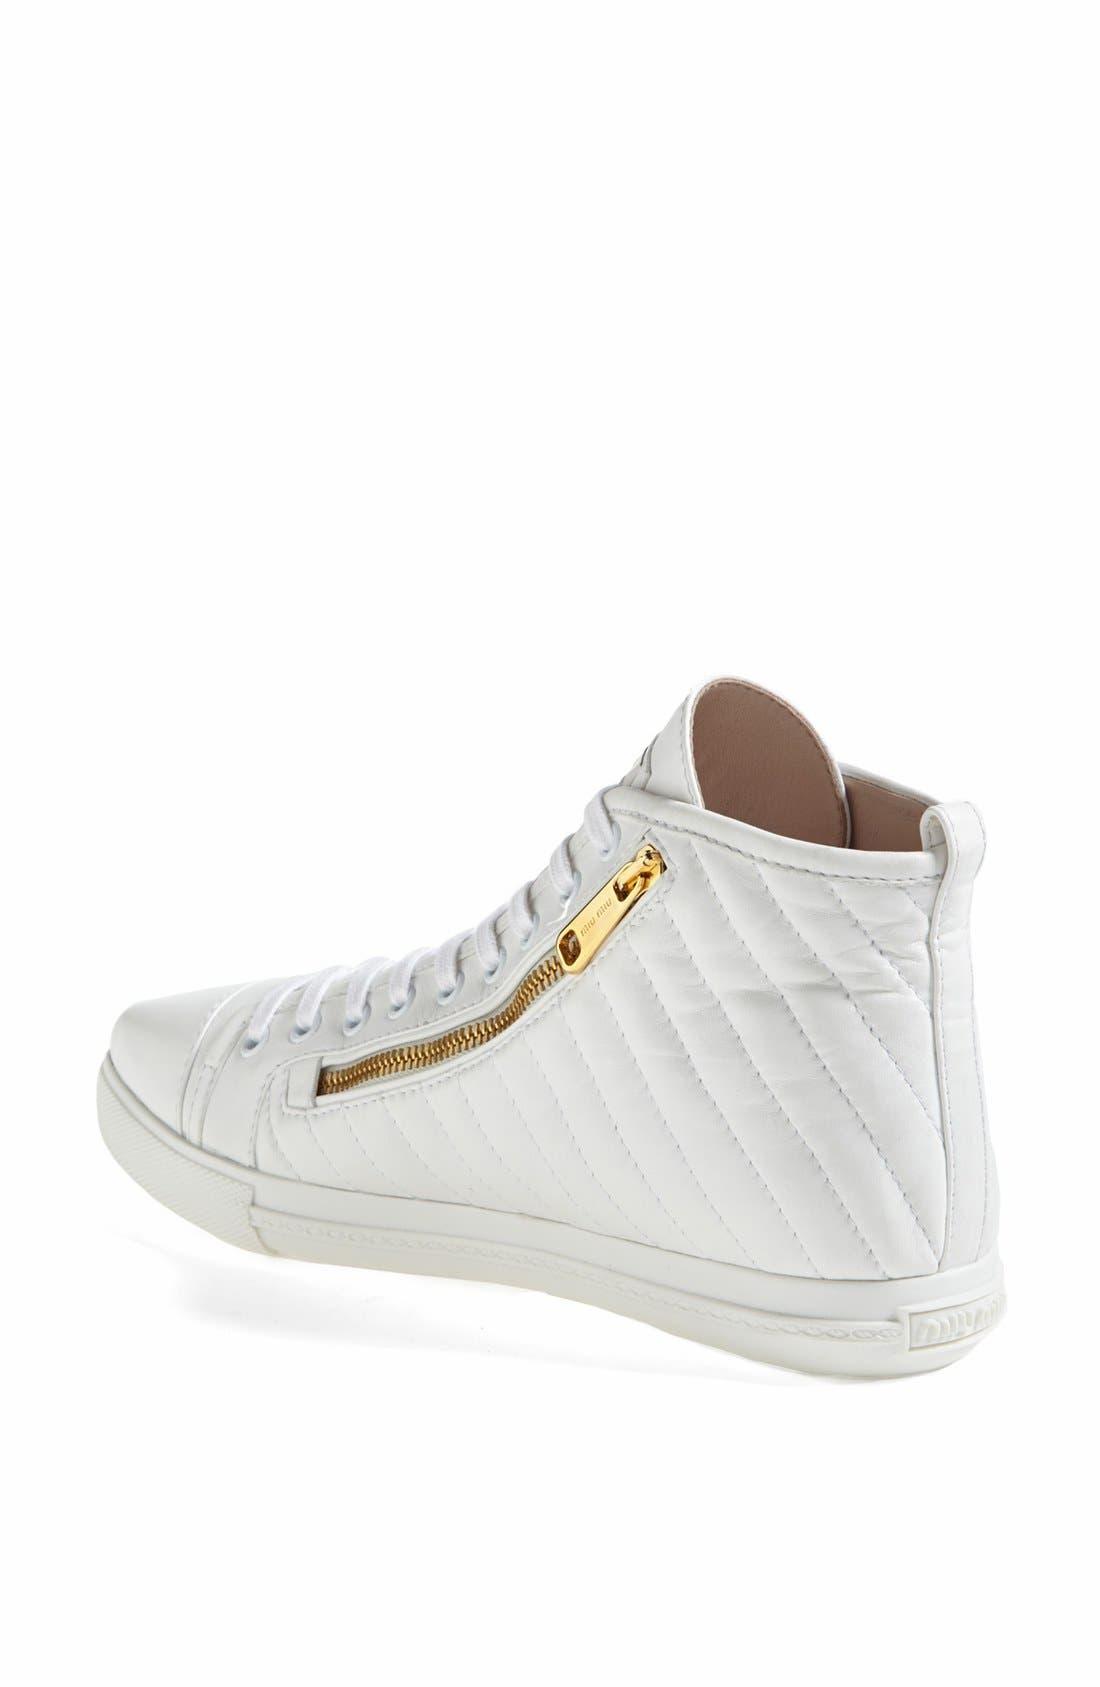 Alternate Image 2  - Miu Miu Side Zip High Top Sneaker